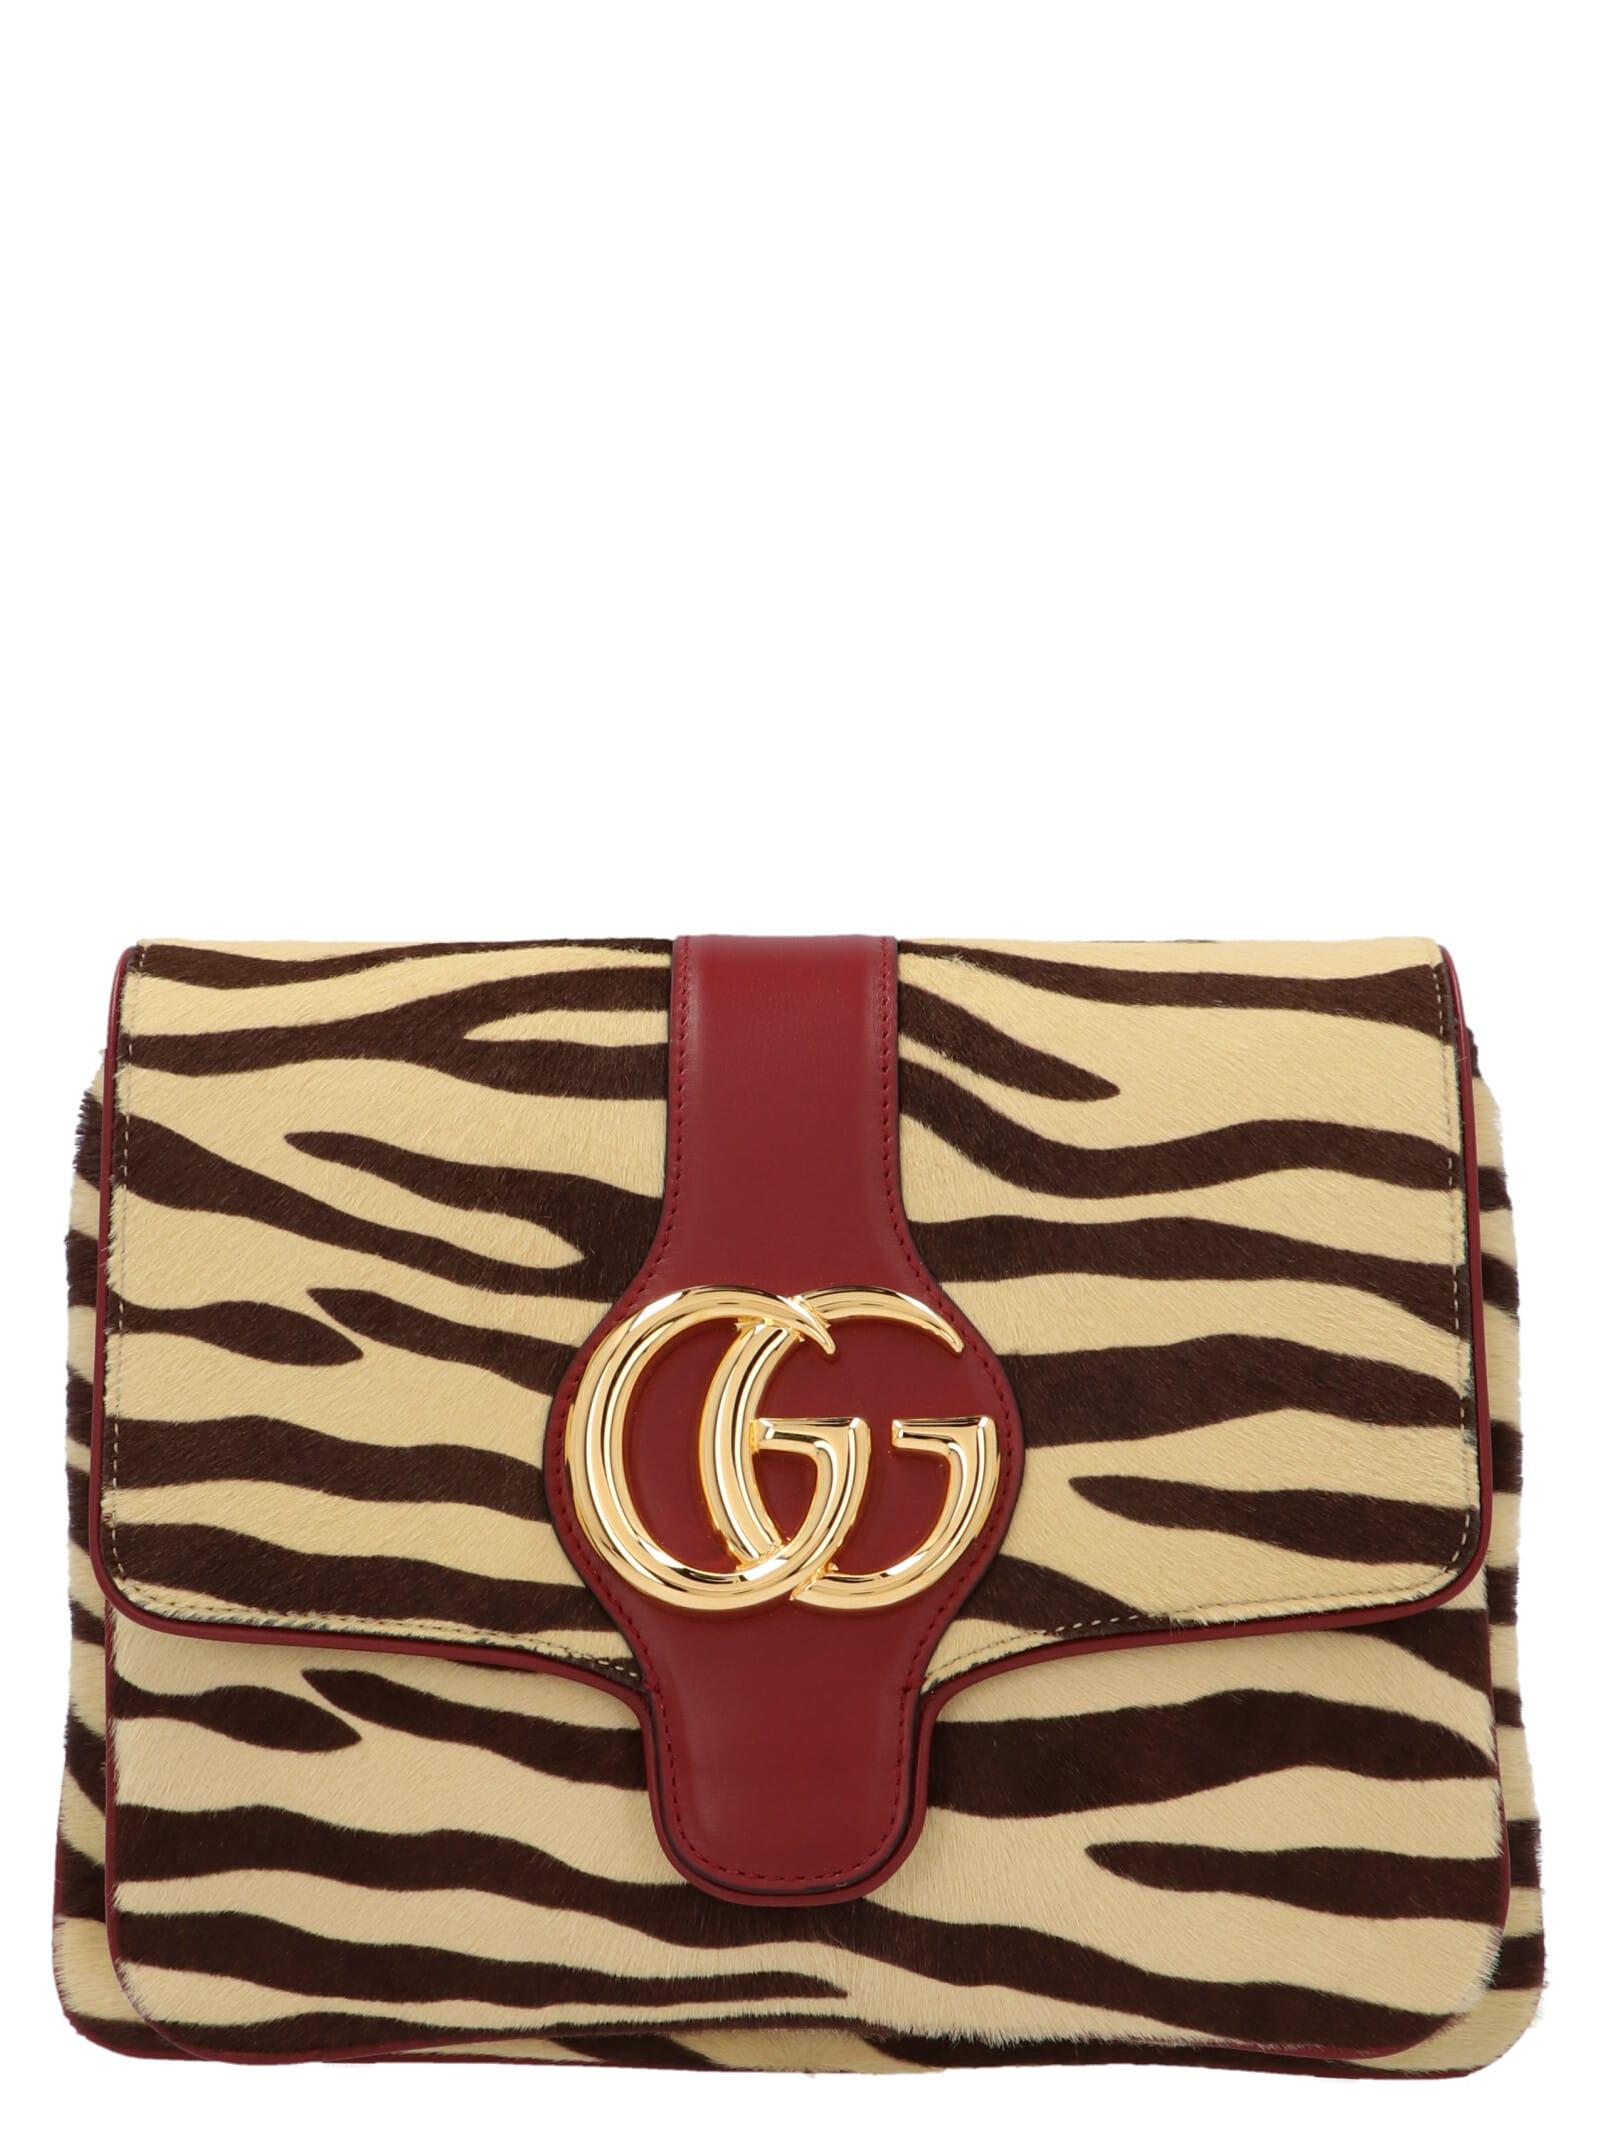 Gucci arli Bag